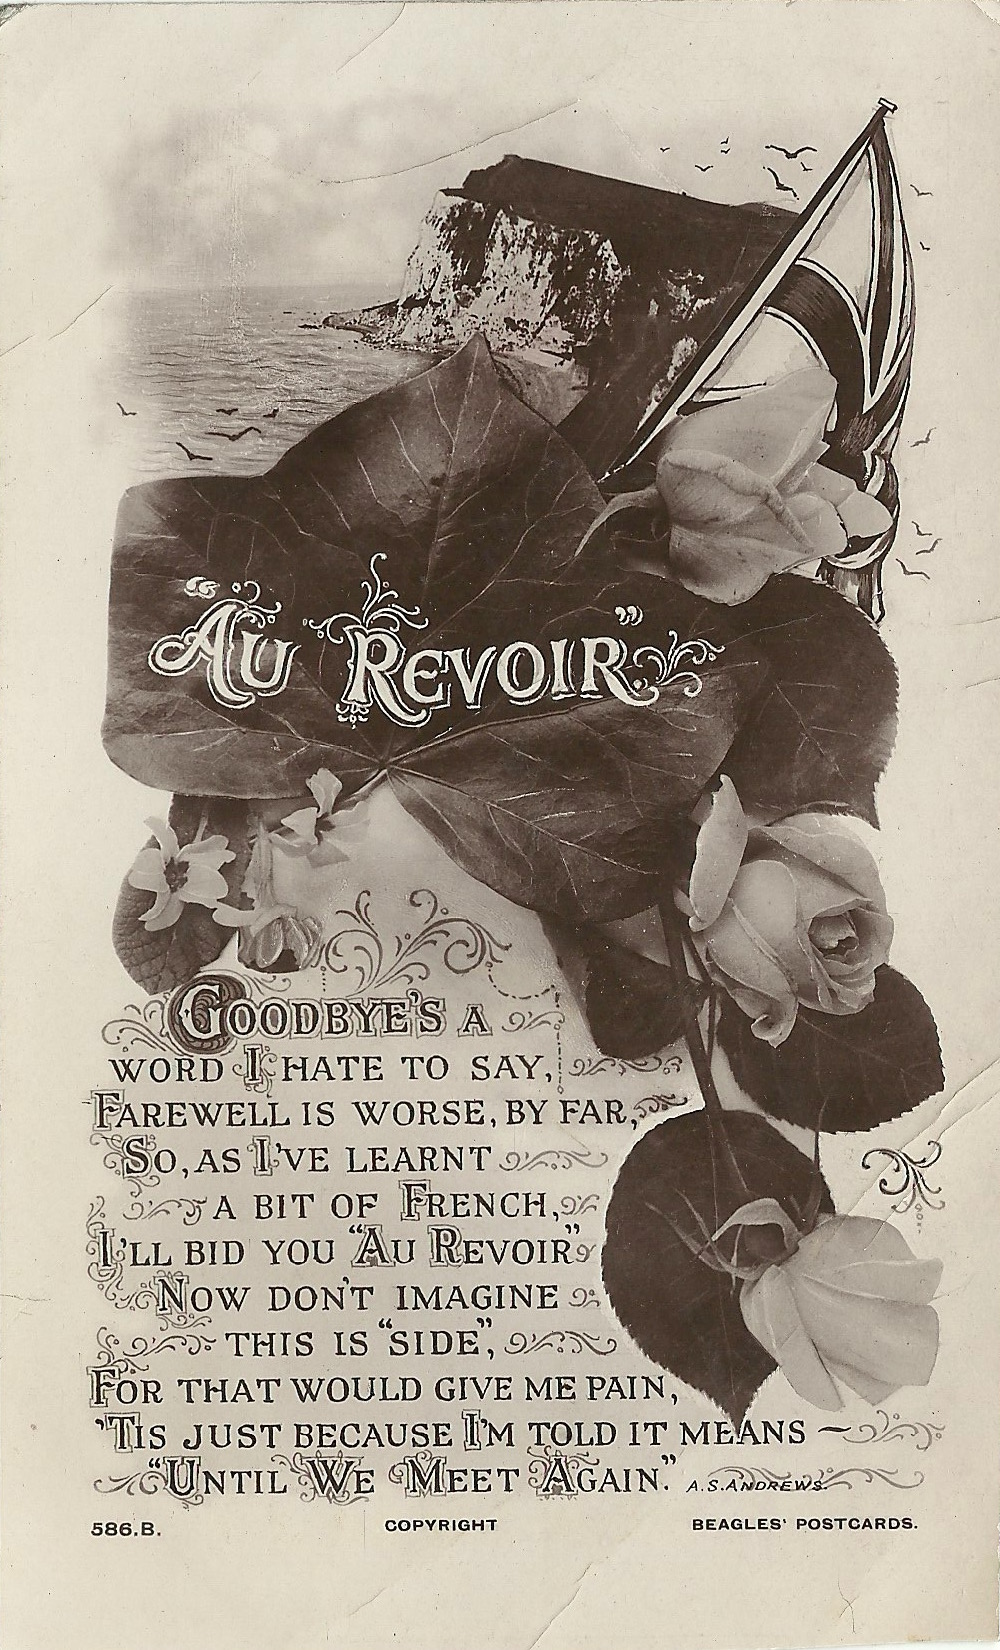 J Beagles & Co unmarked postcard